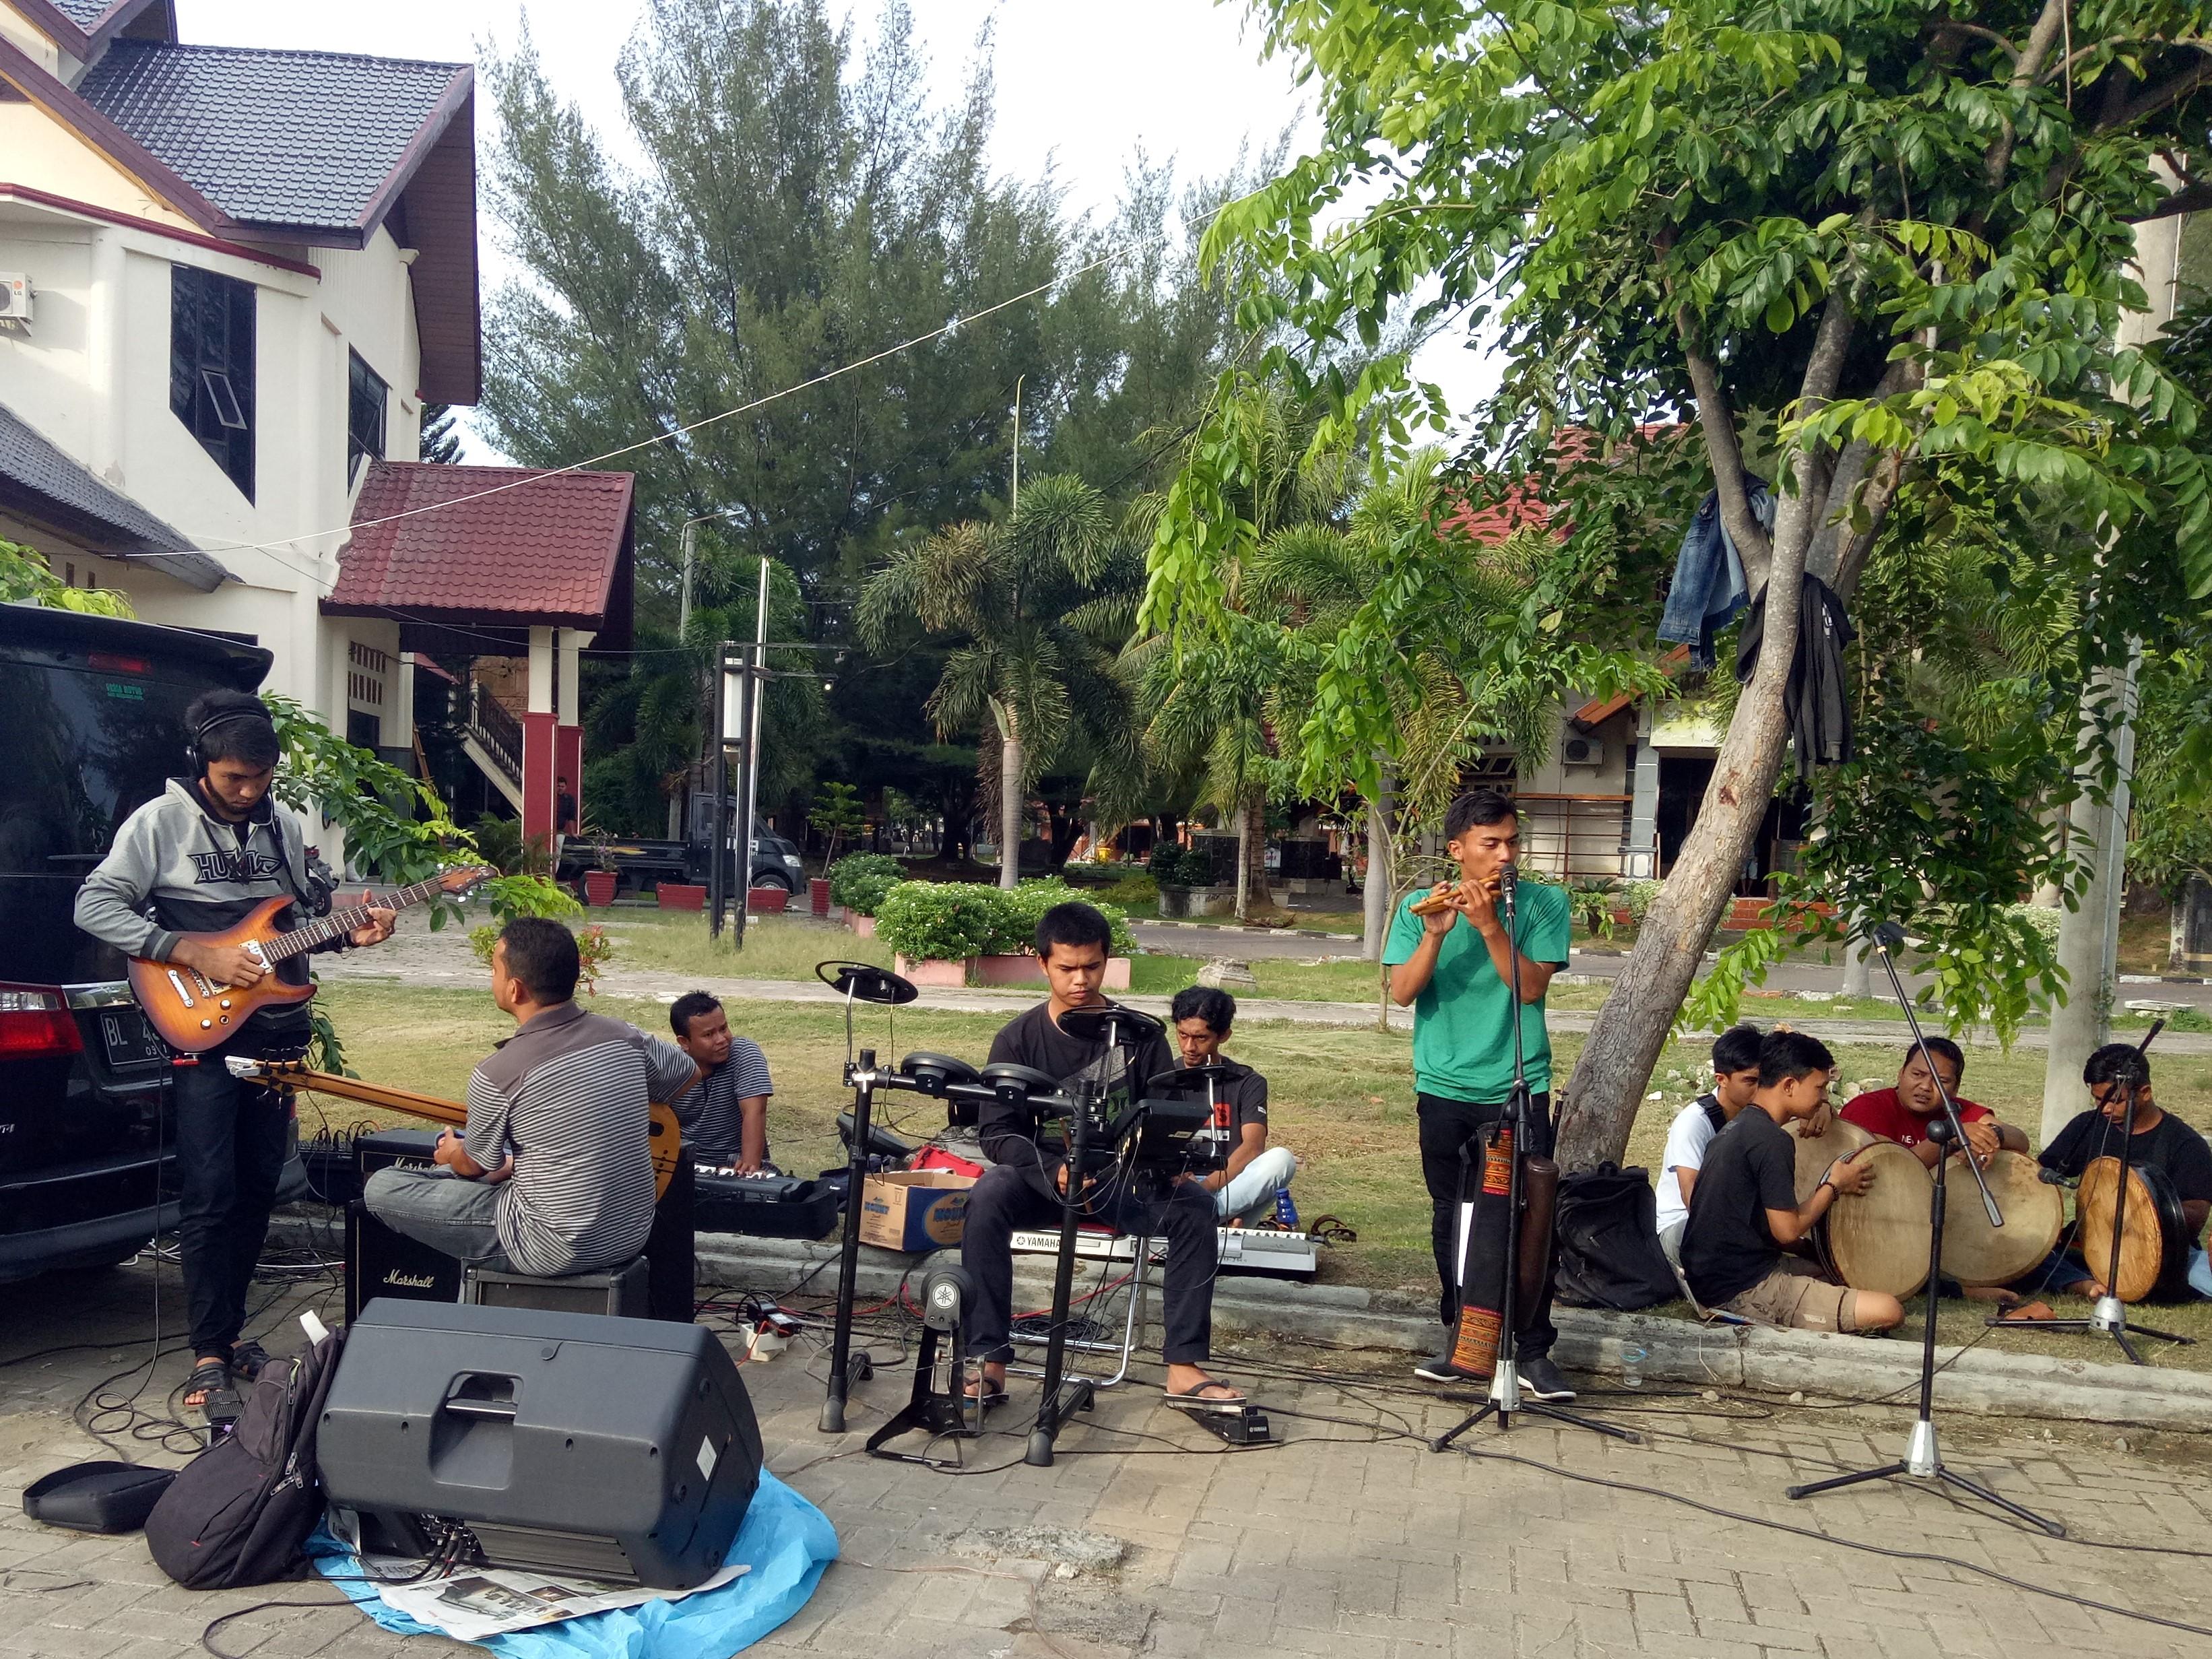 Sail Sabang 2017 Komplek Taman Ratu Safiatuddin Berita Kota Banda